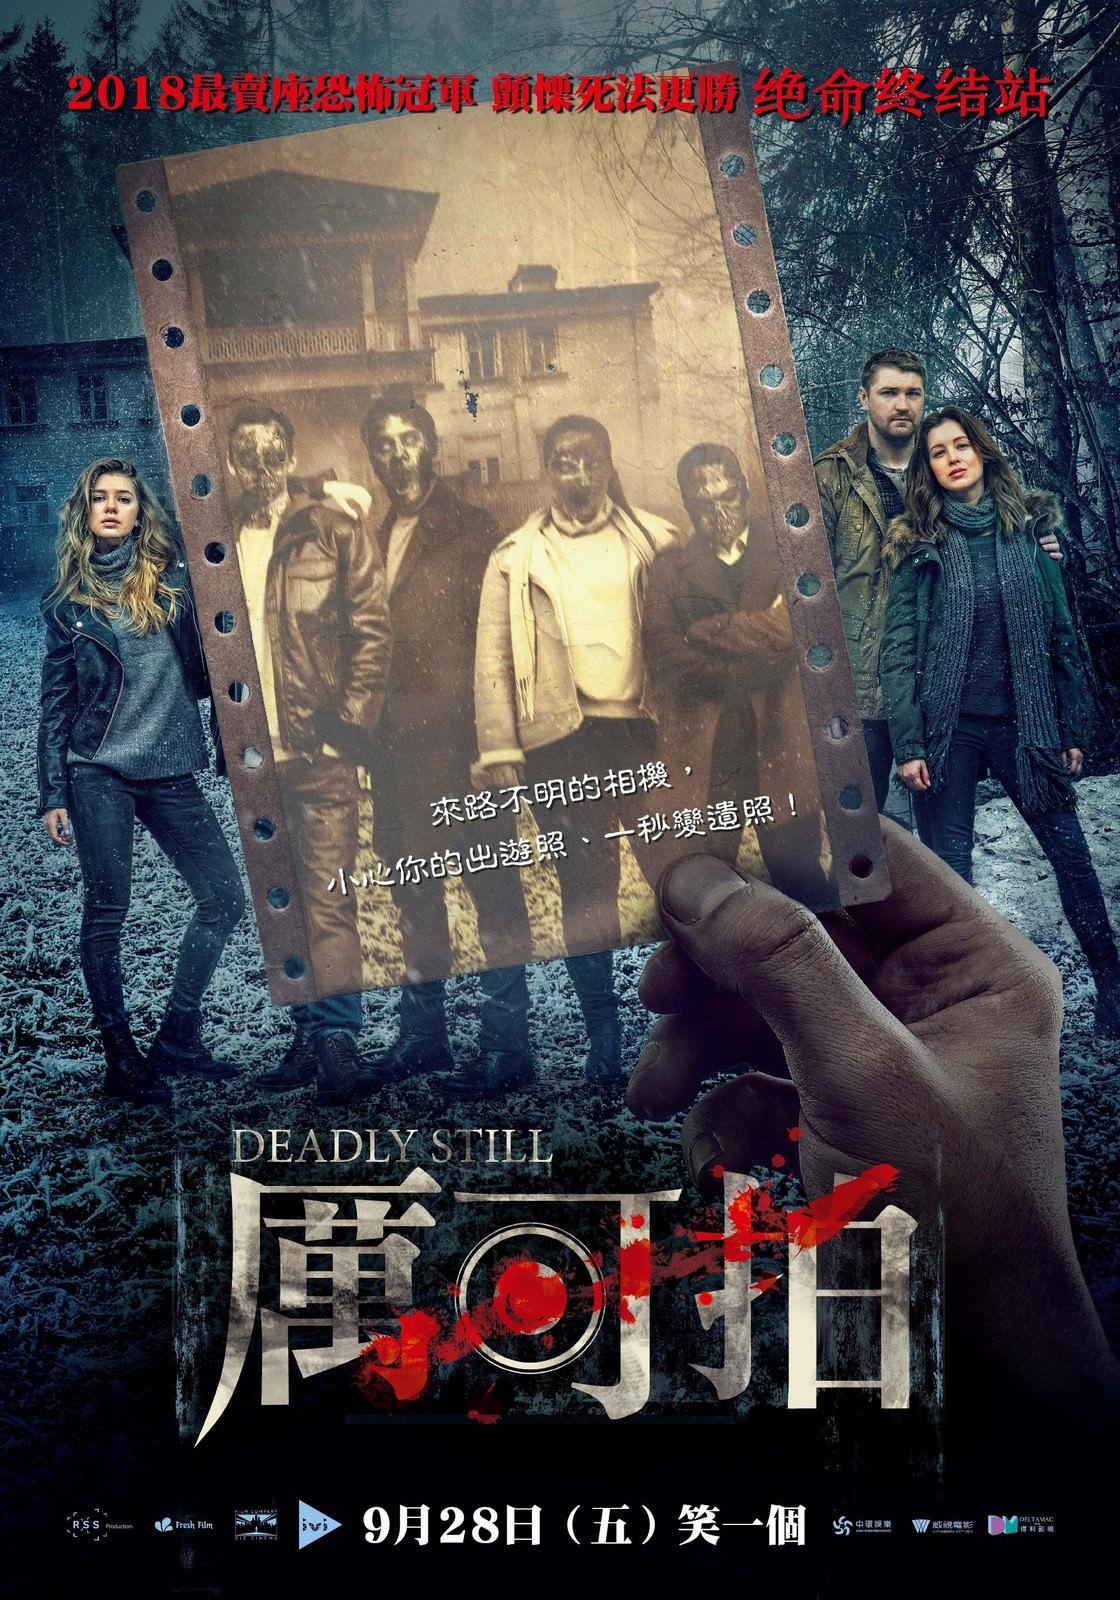 Movie, Фото на память(俄羅斯, 2018) / 厲可拍(台灣) / Deadly Still(英文) / 鬼照片(網路), 電影海報, 台灣